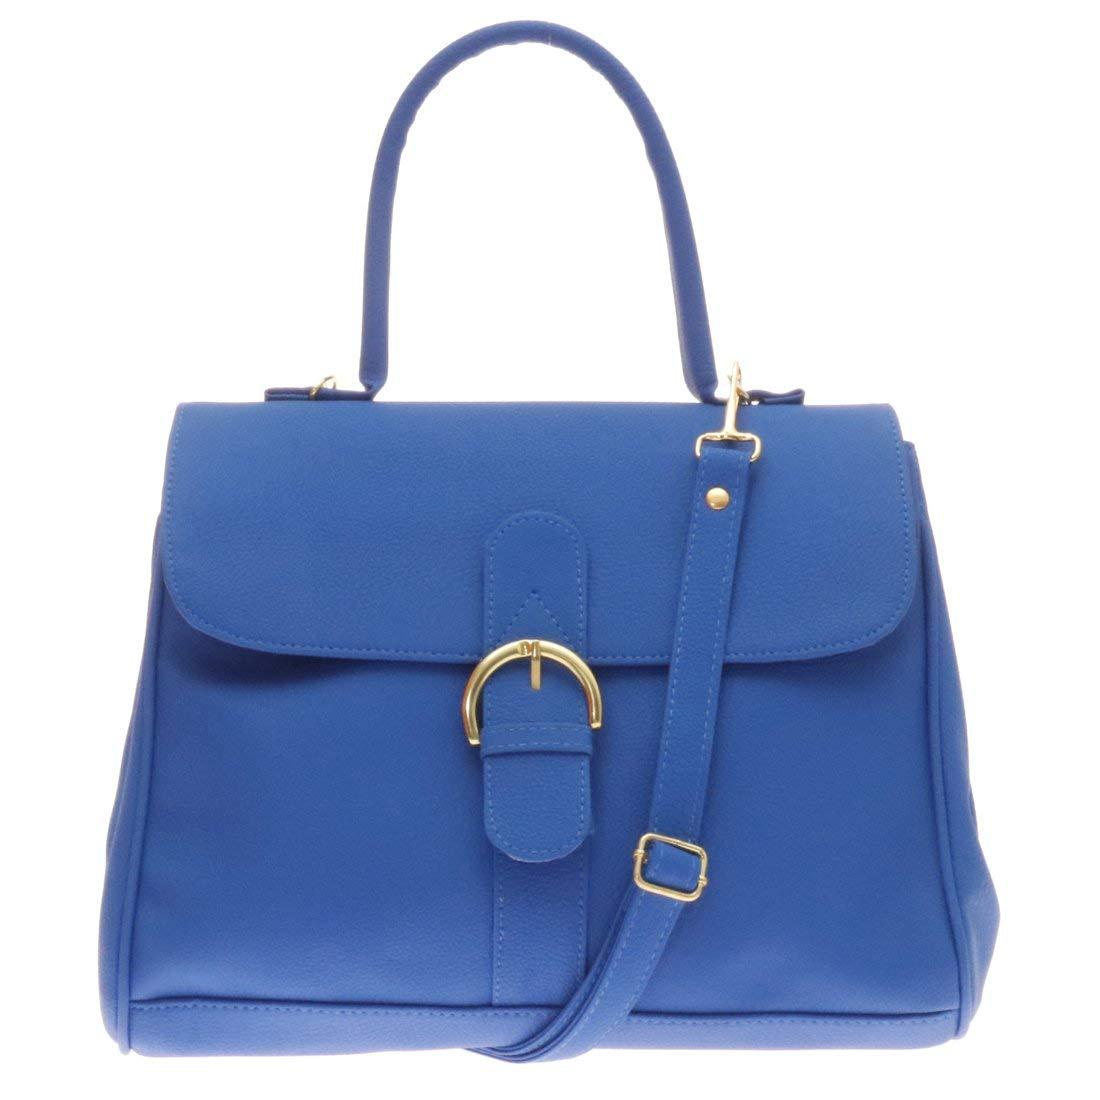 e3e1b0b31d Twinya Women s PU Leather Satchel Handbags Shoulder Bag Beautiful Top  Handle Satchel with Adjustable Straps